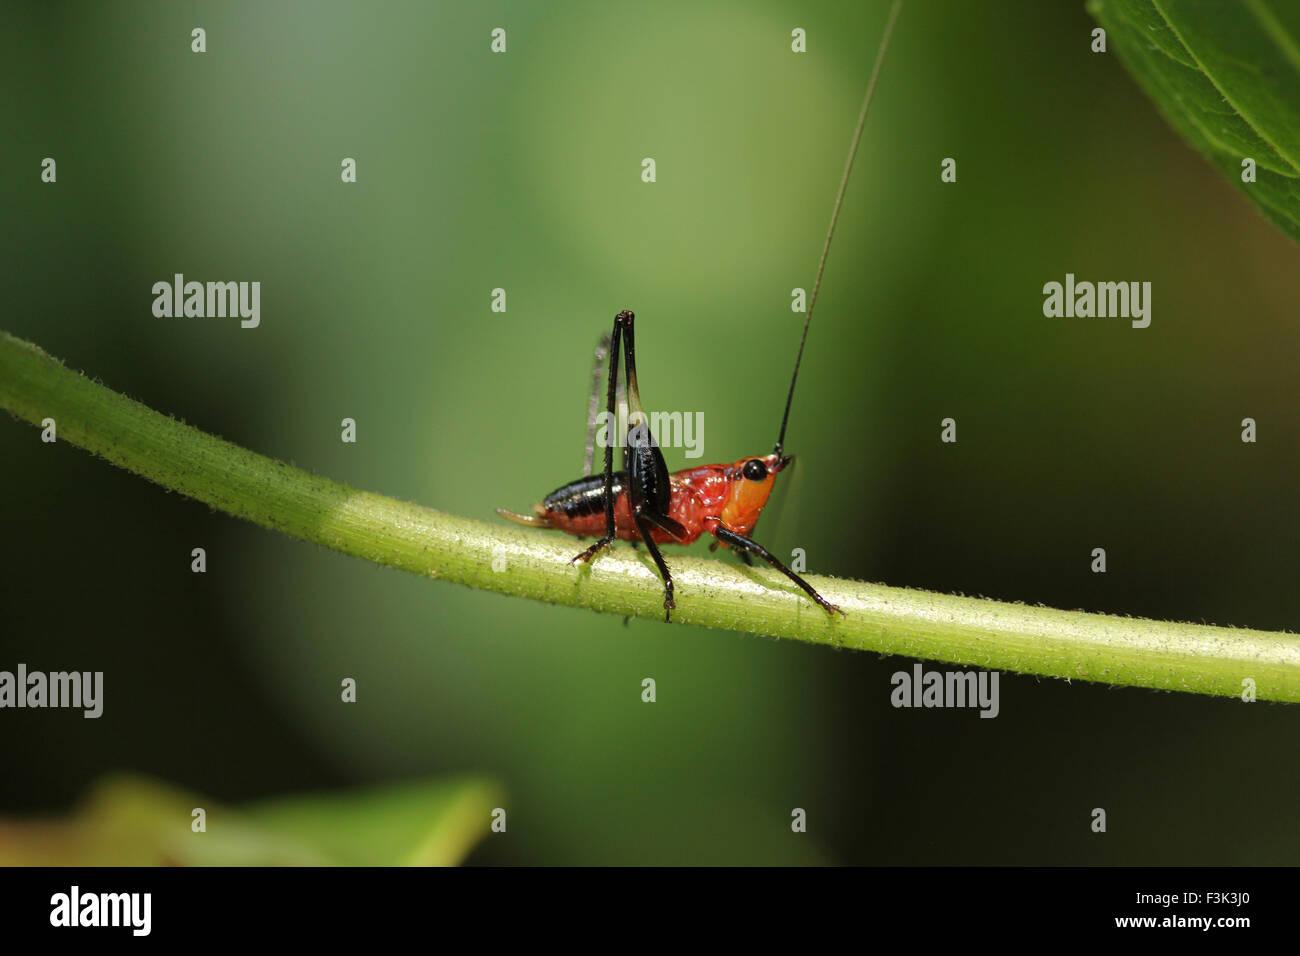 Orange Nymphe Grashuepfer, Conocephalus sp, Tettigoniidae, Tripura, Indien Stockbild